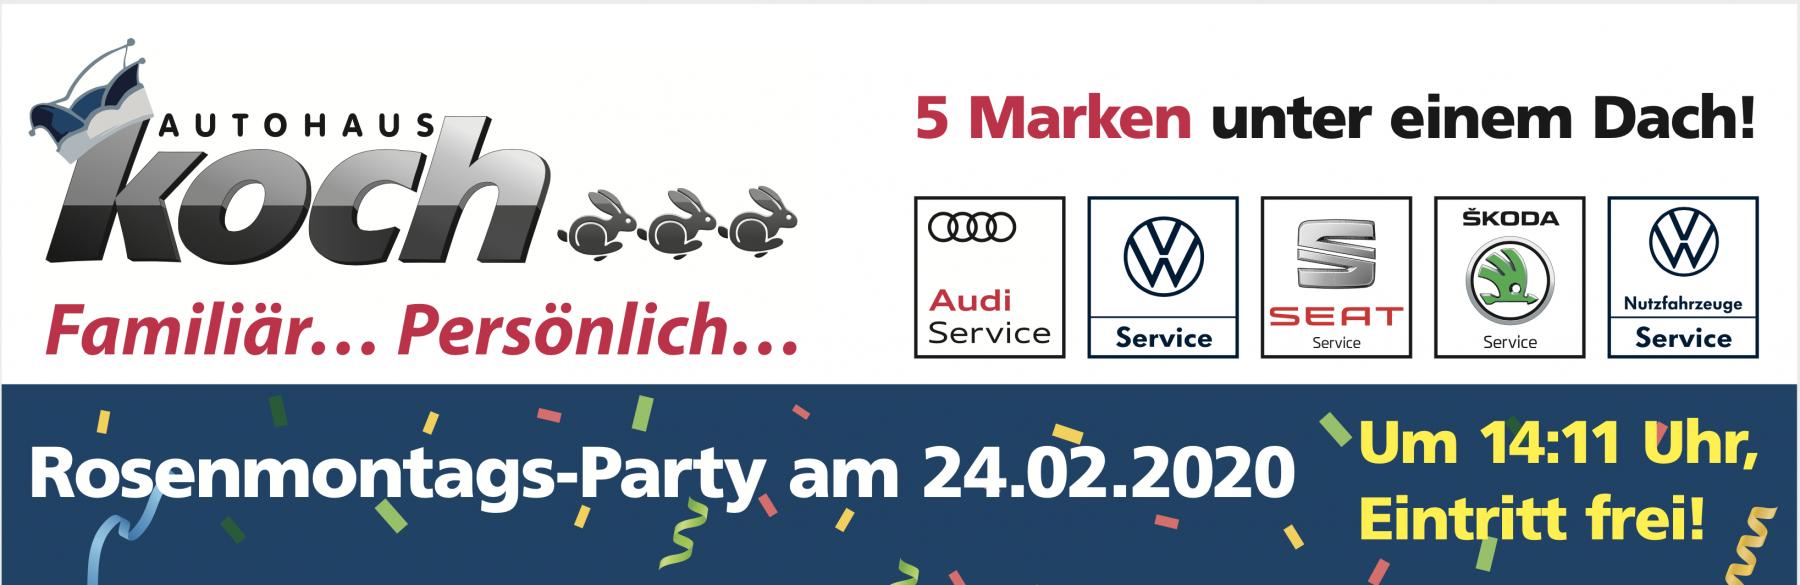 Autohaus-Koch-2020